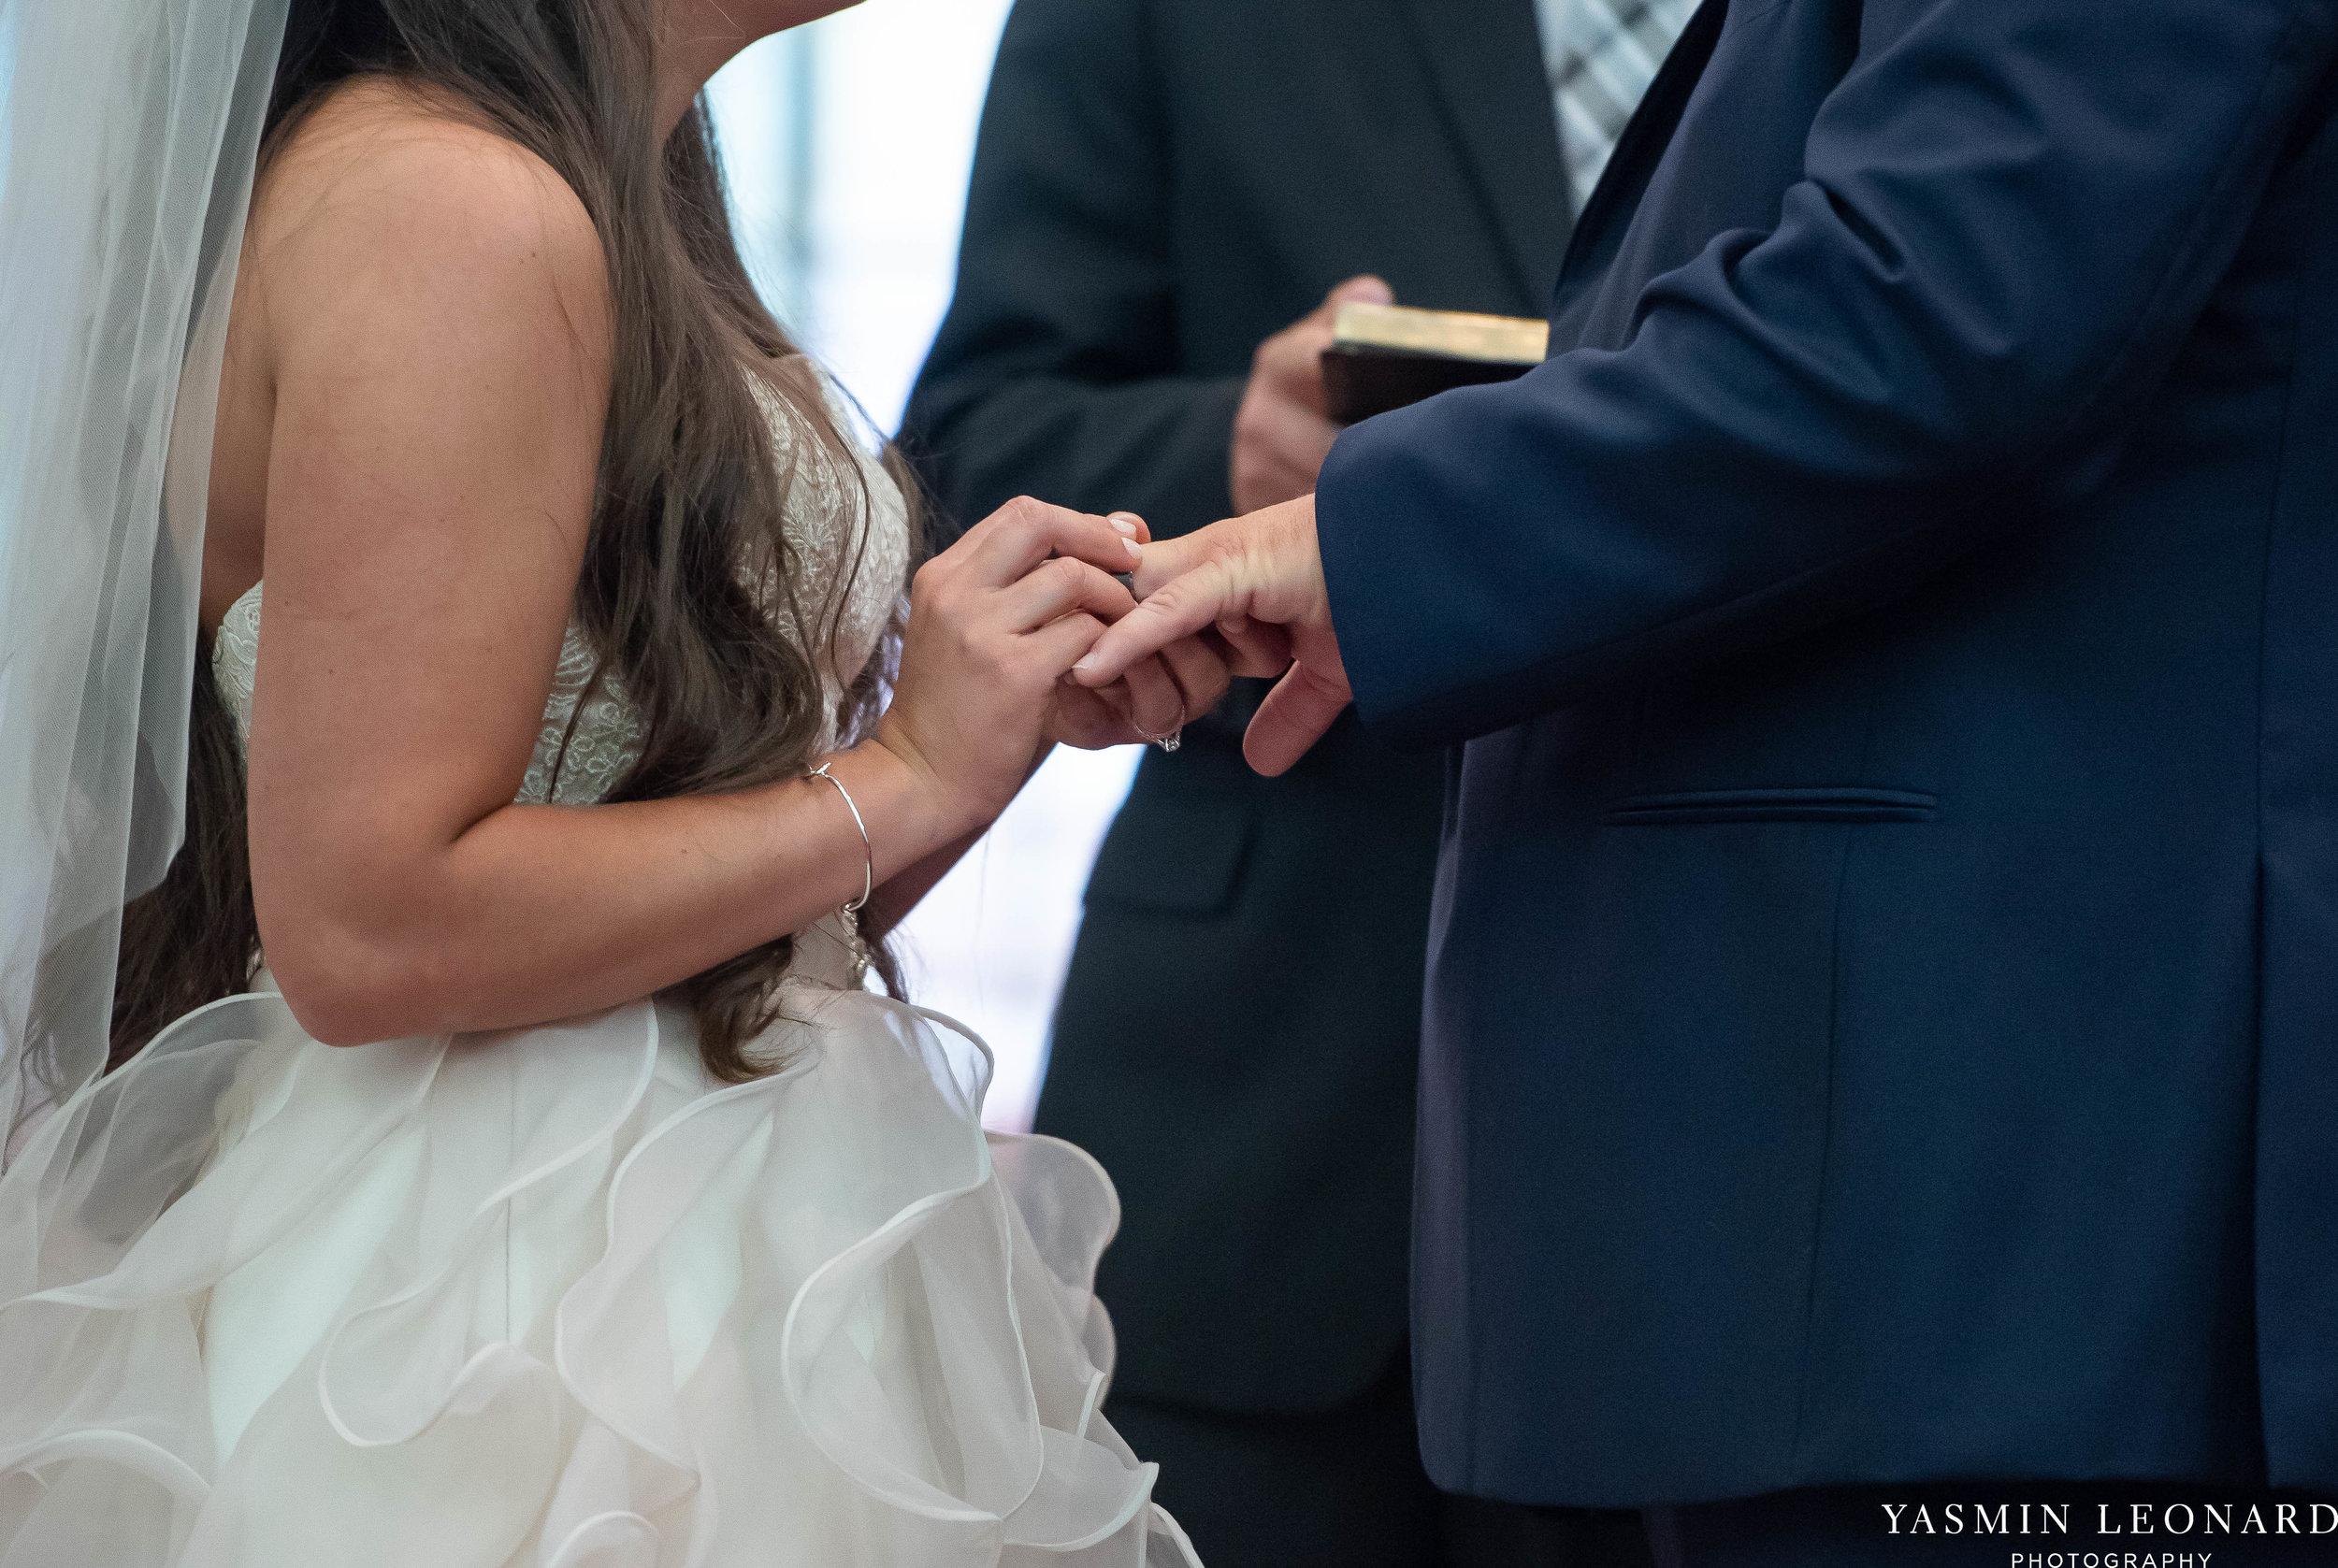 Rain on your wedding day - Rainy Wedding - Plan B for Rain - What to do if it rains on your wedding day - Wedding Inspiration - Outdoor wedding ideas - Rainy Wedding Pictures - Yasmin Leonard Photography-24.jpg